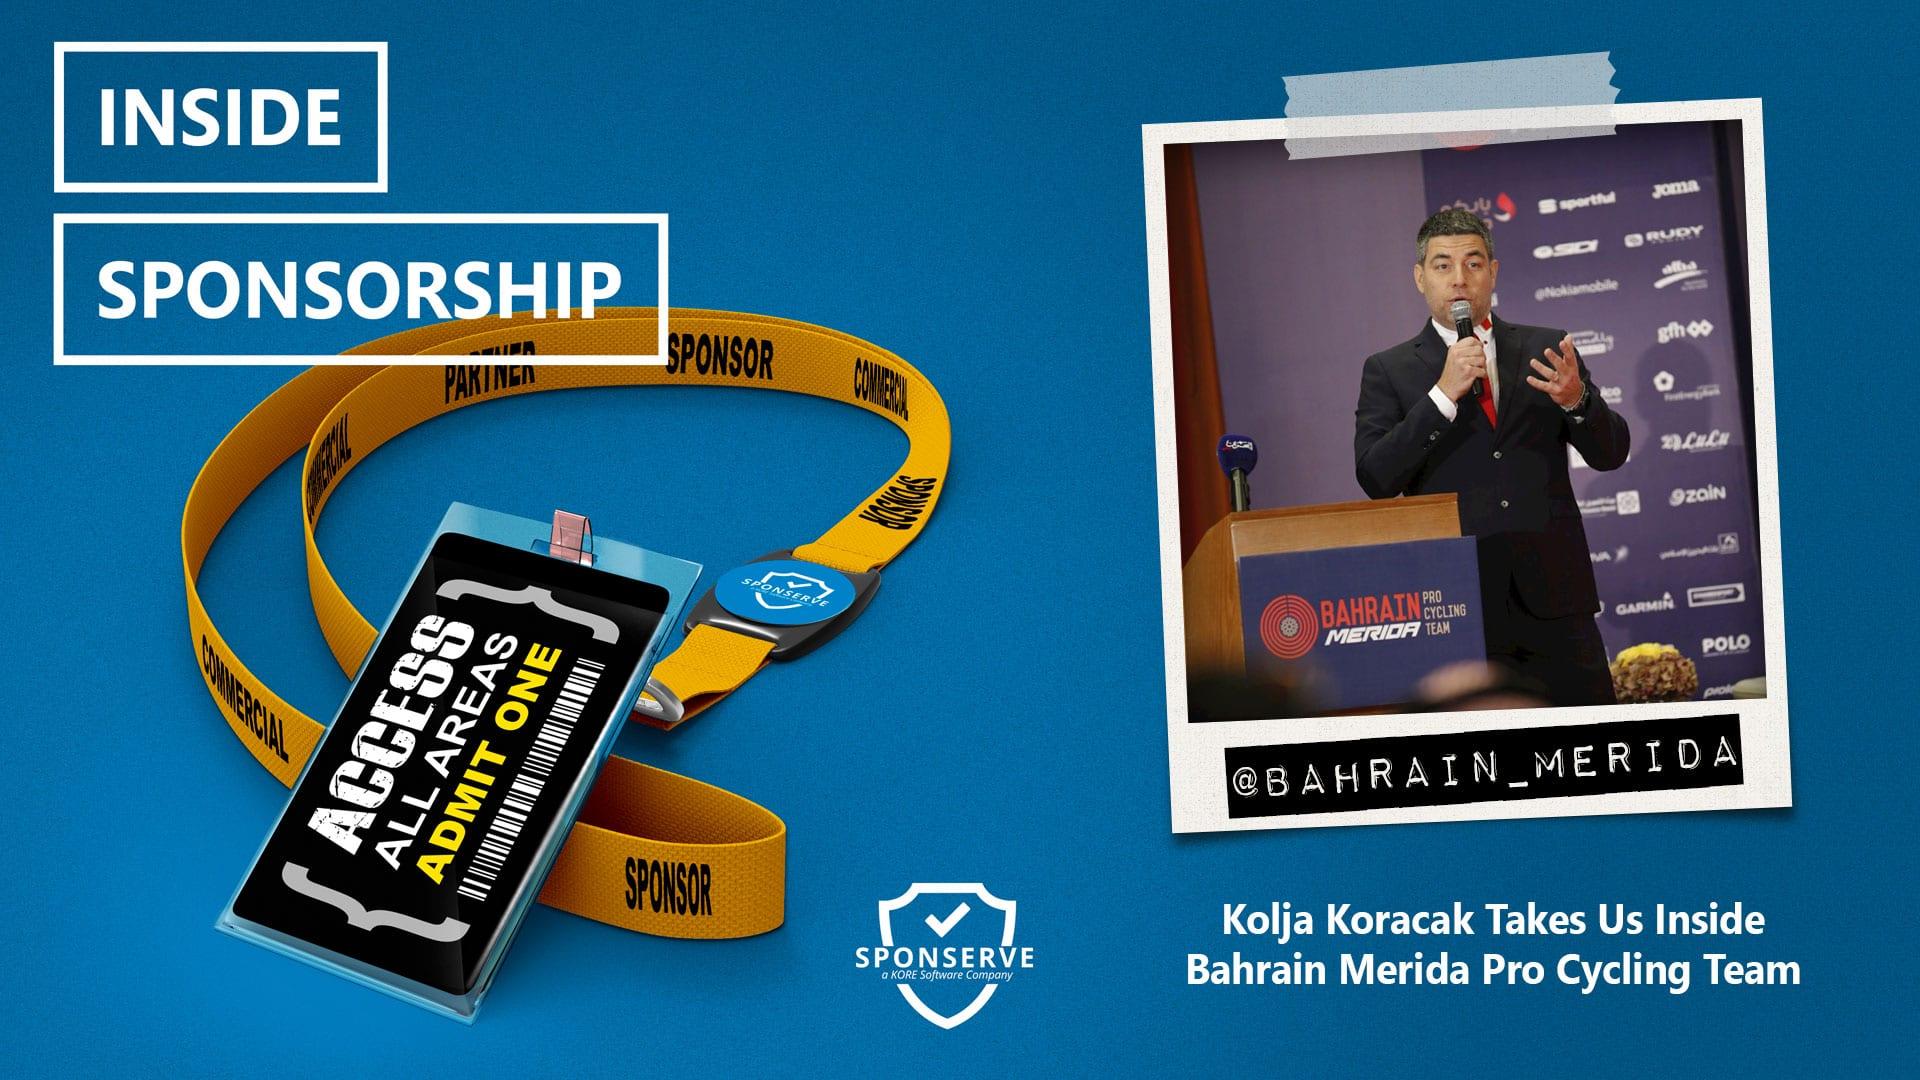 Inside-Sponsorship-Bahrain-Merida-Pro-Cycling-Team-Kolja-Koracak